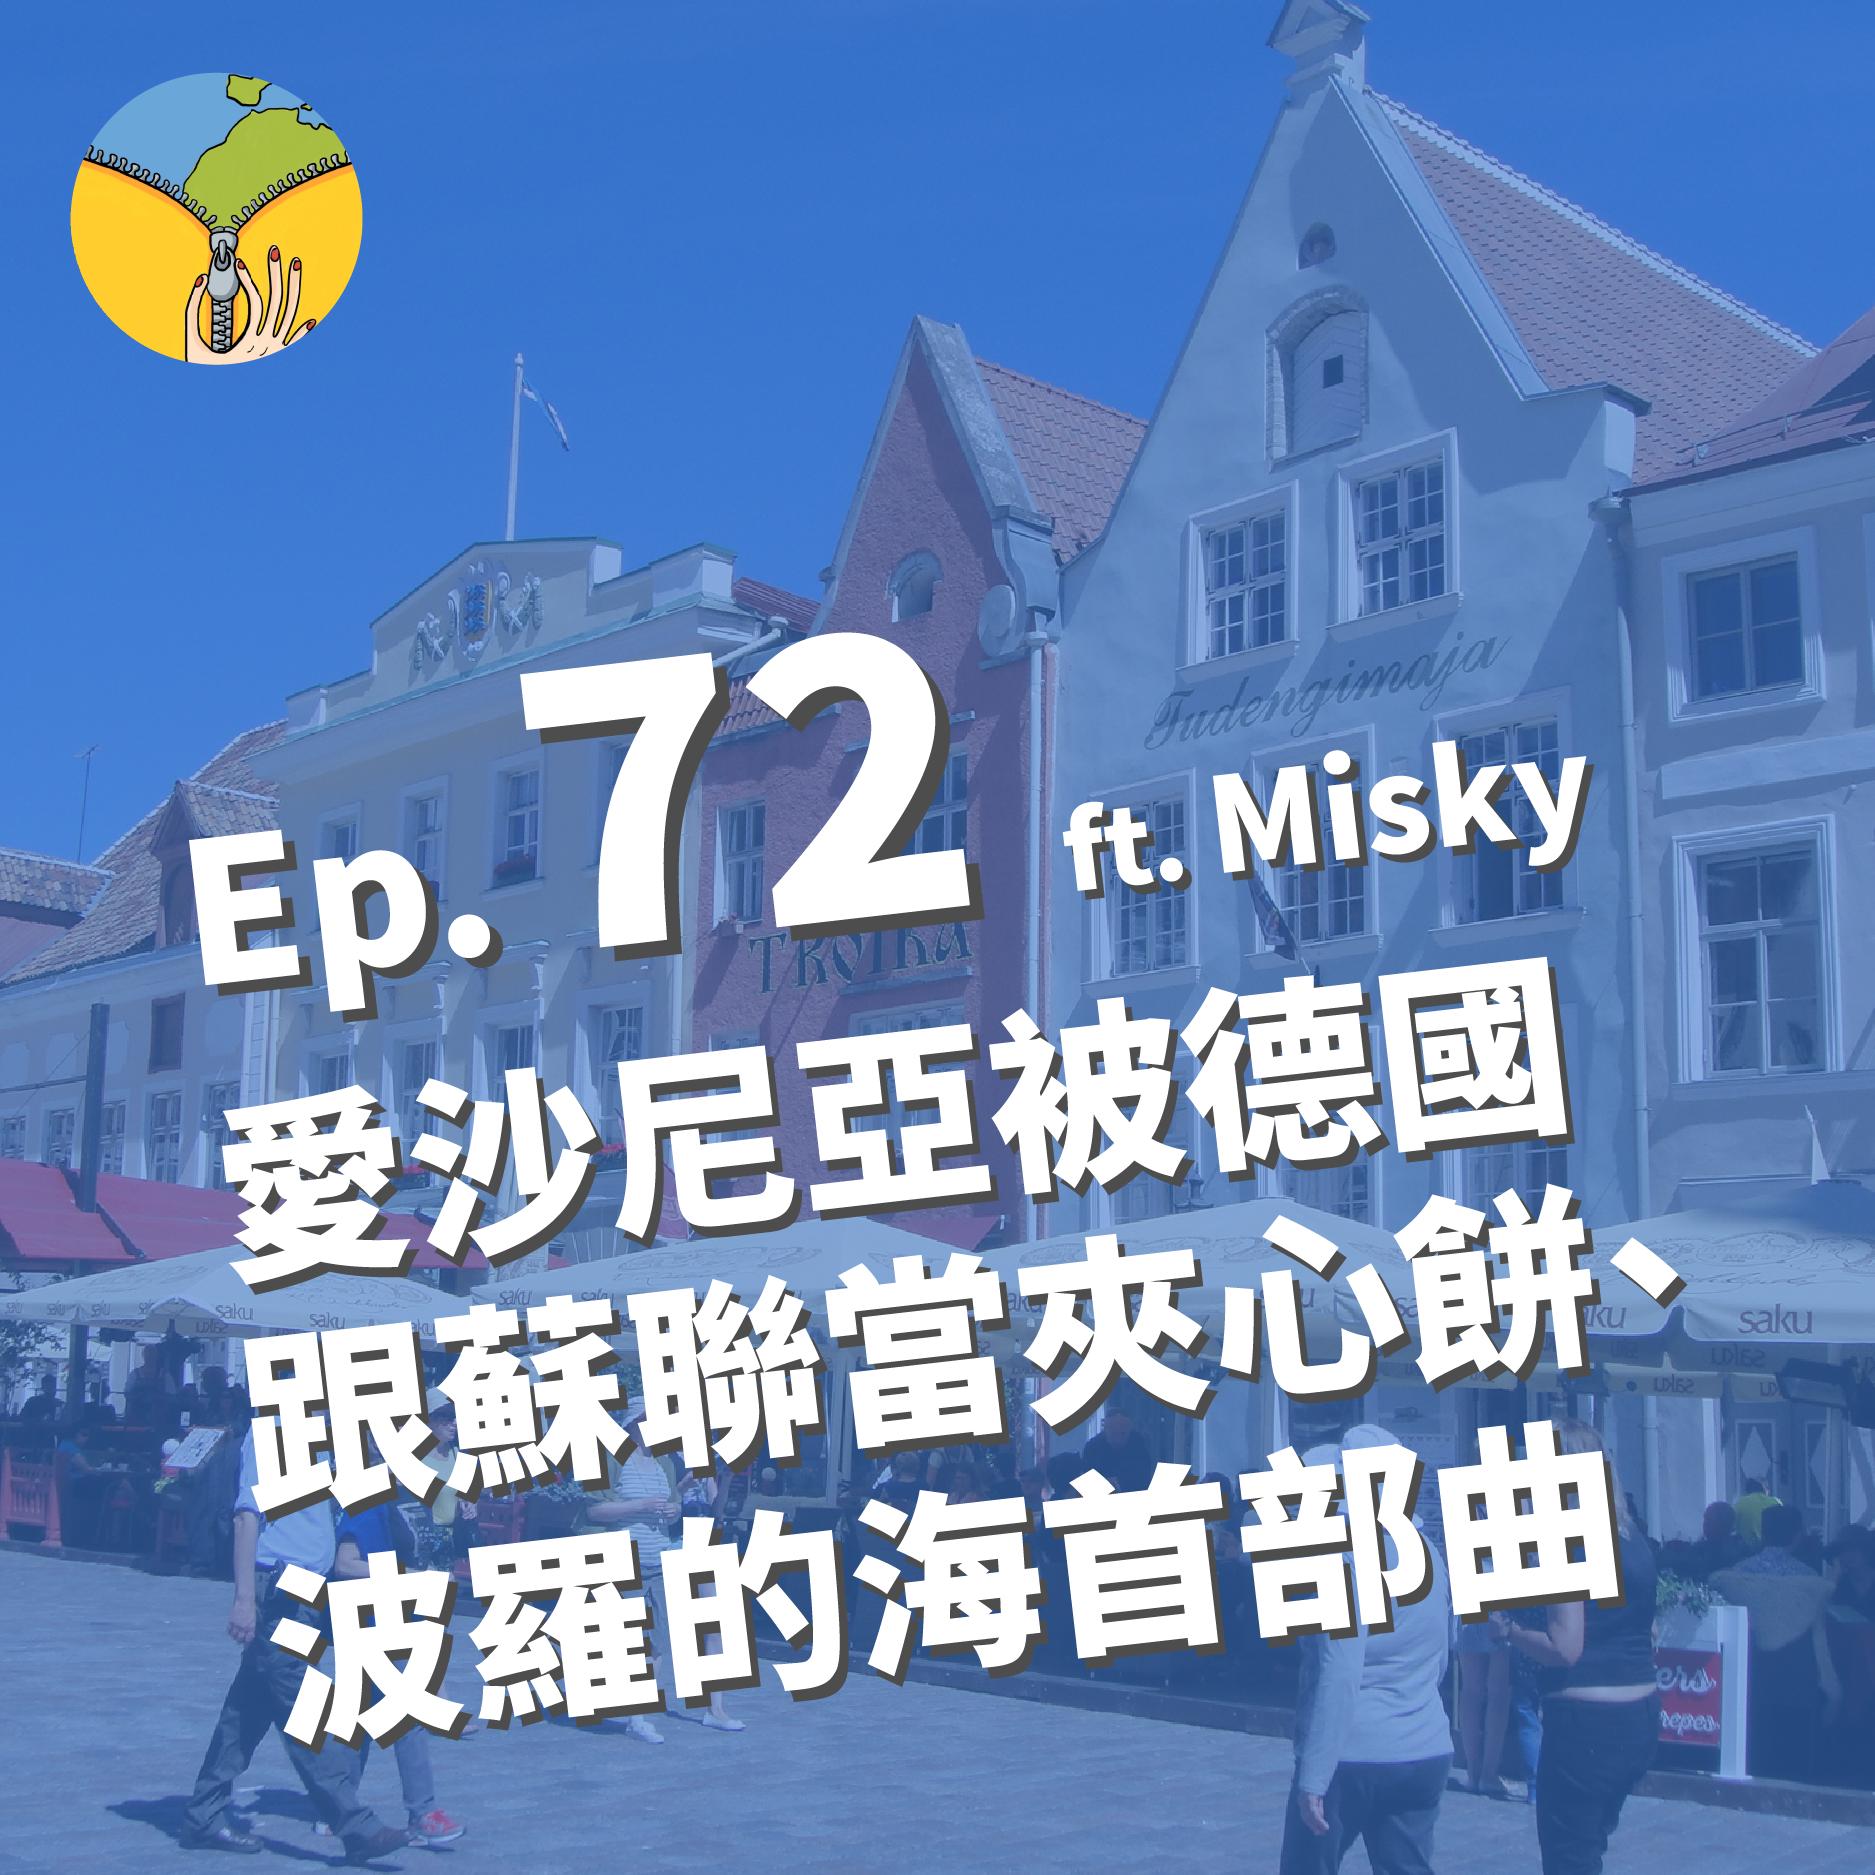 Ep.72 愛沙尼亞被德國跟蘇聯當夾心餅 | 波羅的海首部曲 | 三小國有很小嗎 ft. Misky